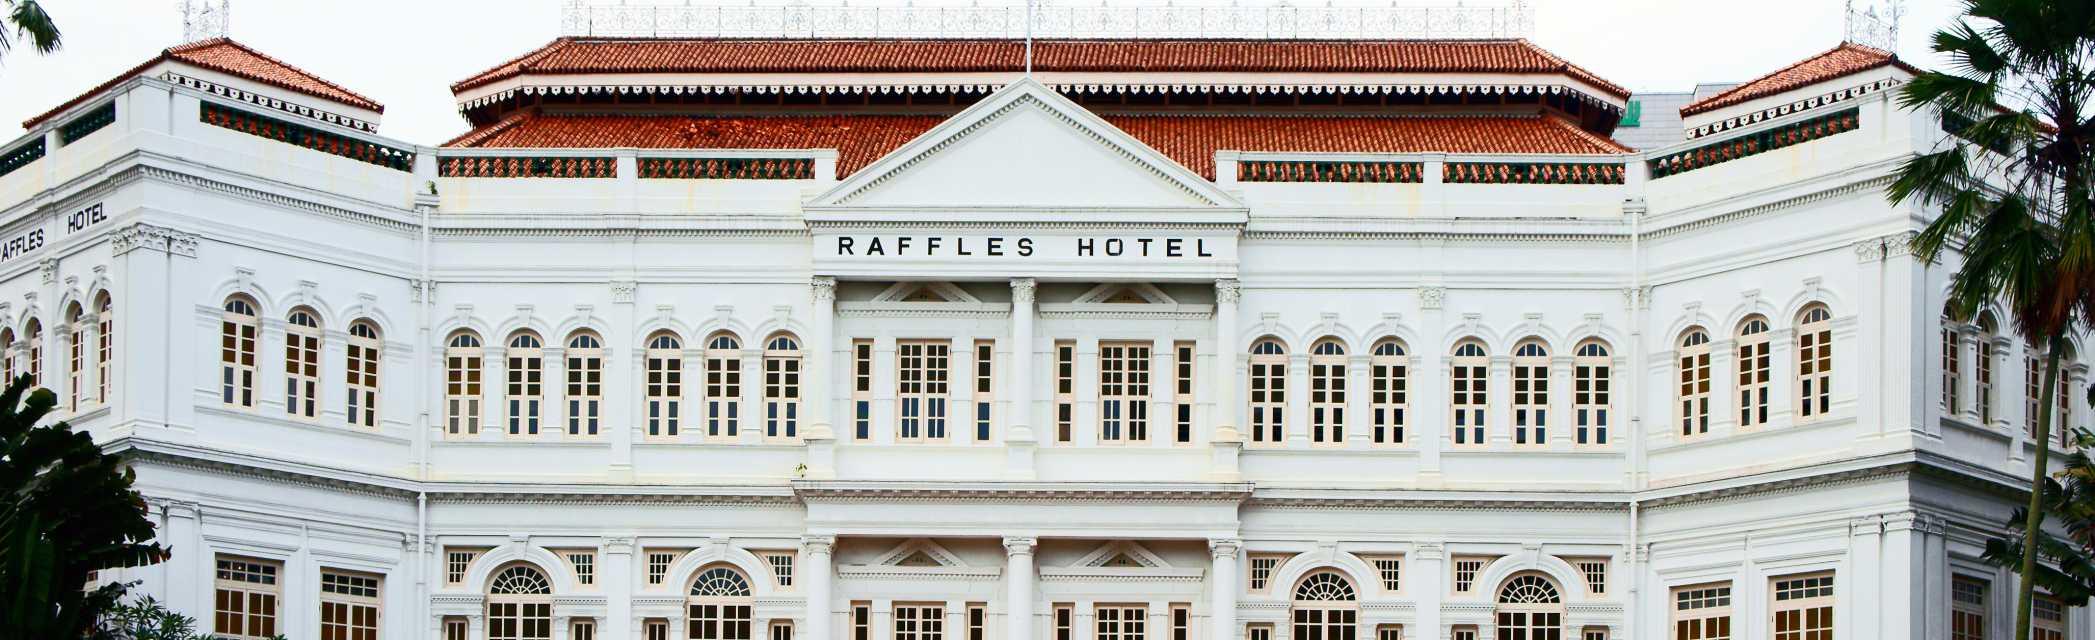 sonnenklar.TV Reisebüro | Raffels Hotel Singapur